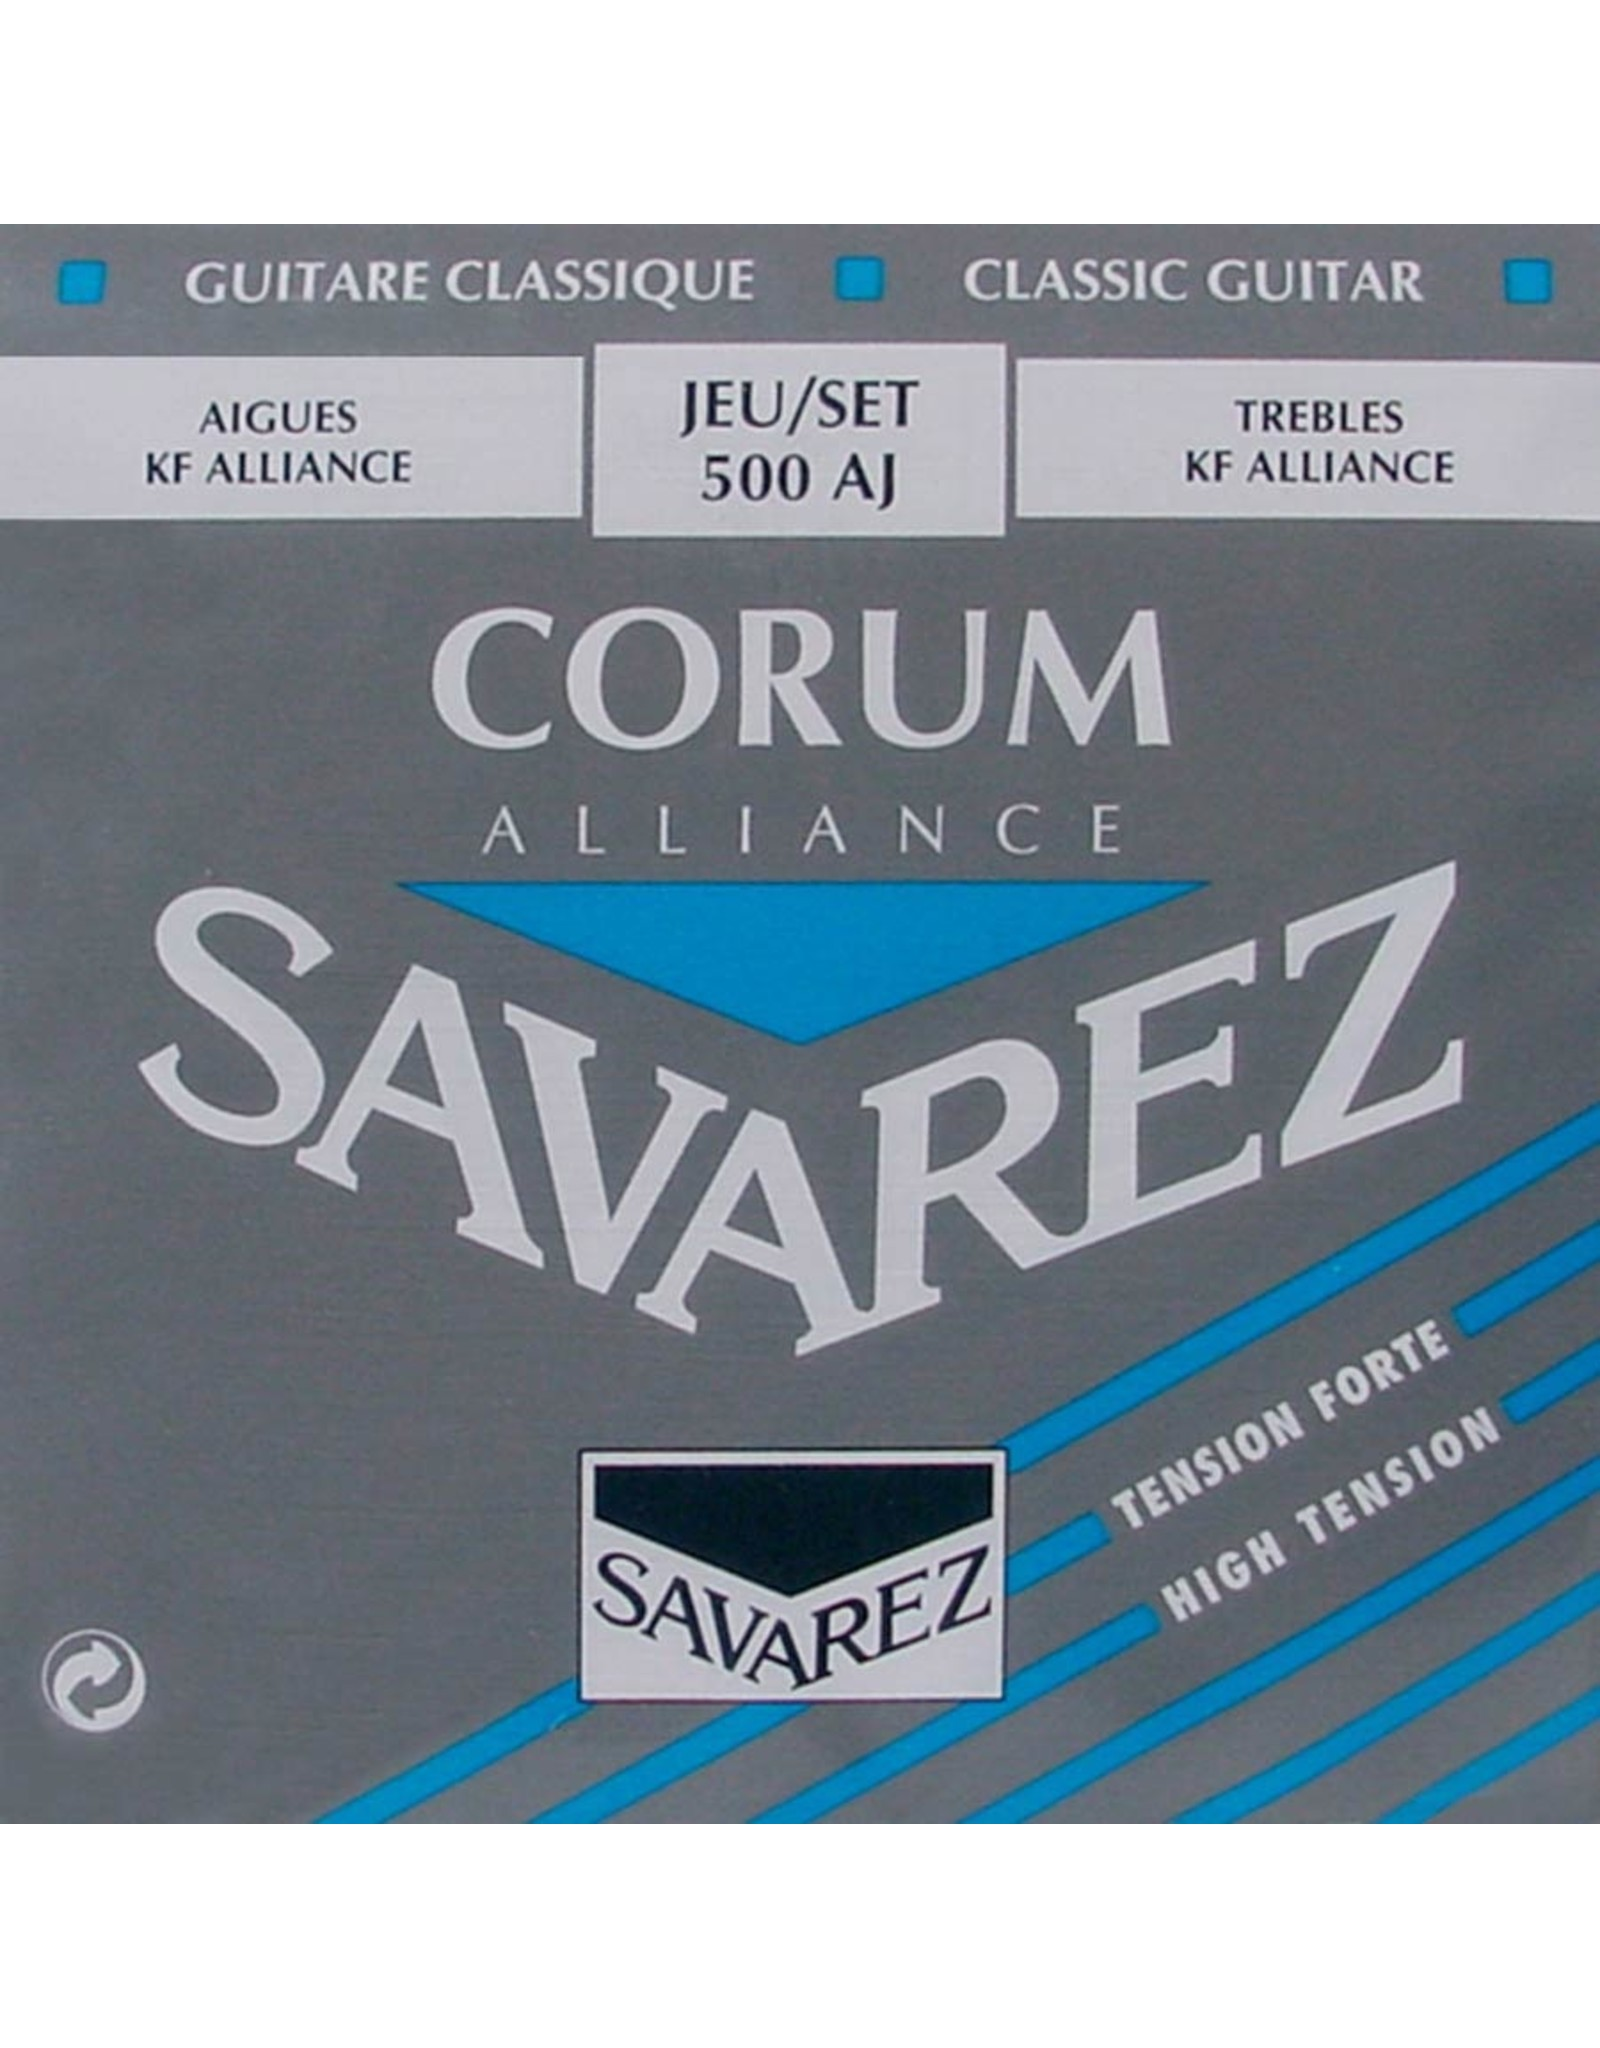 Savarez Savarez Corum Alliance 500-AJ